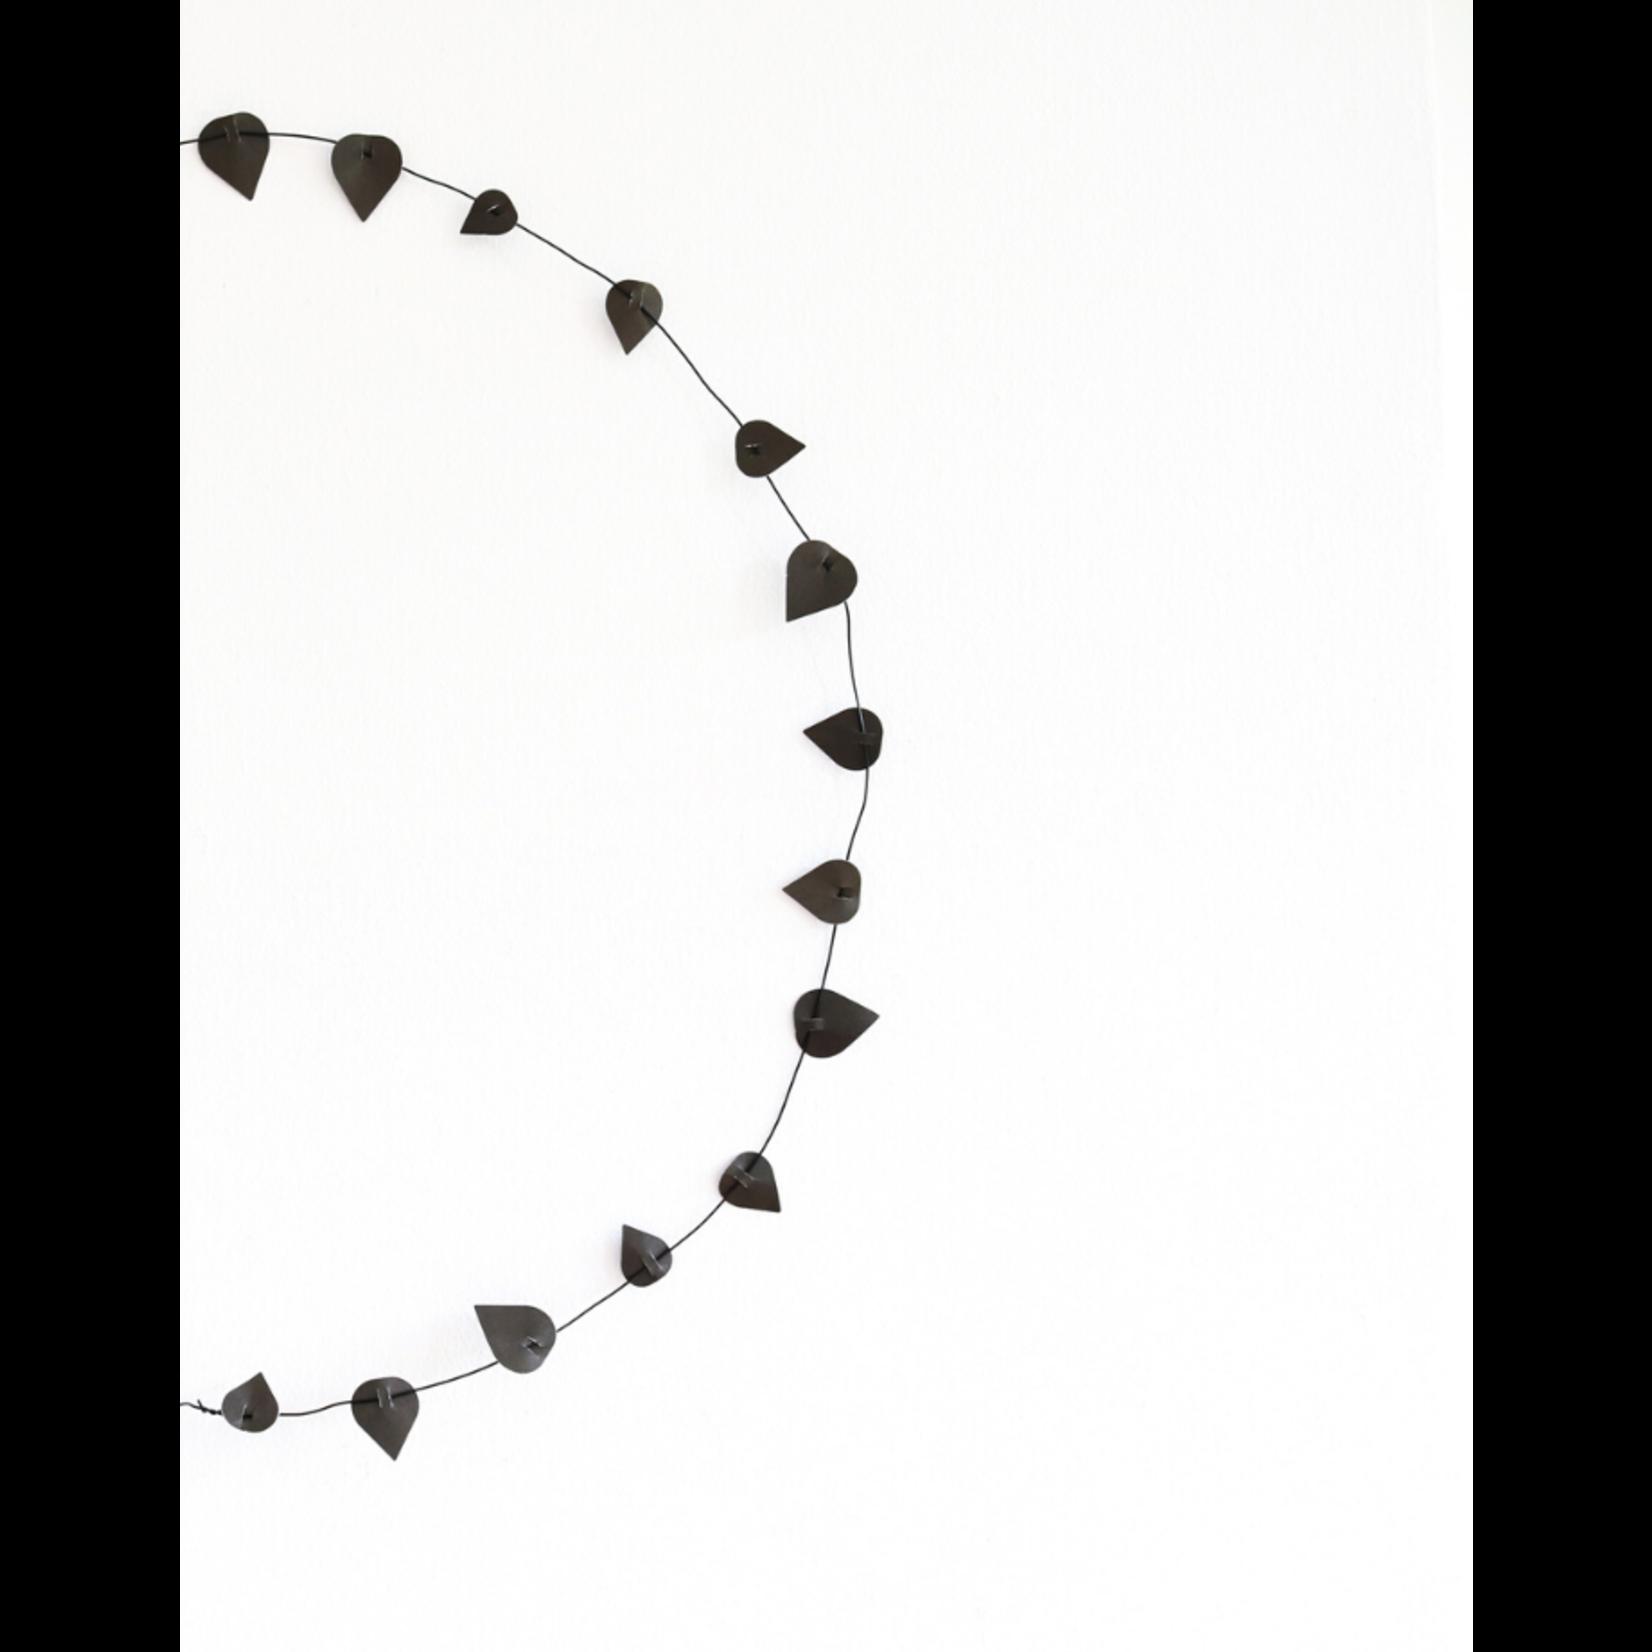 jurianne matter  jurianne matter - twig leaves - zwart